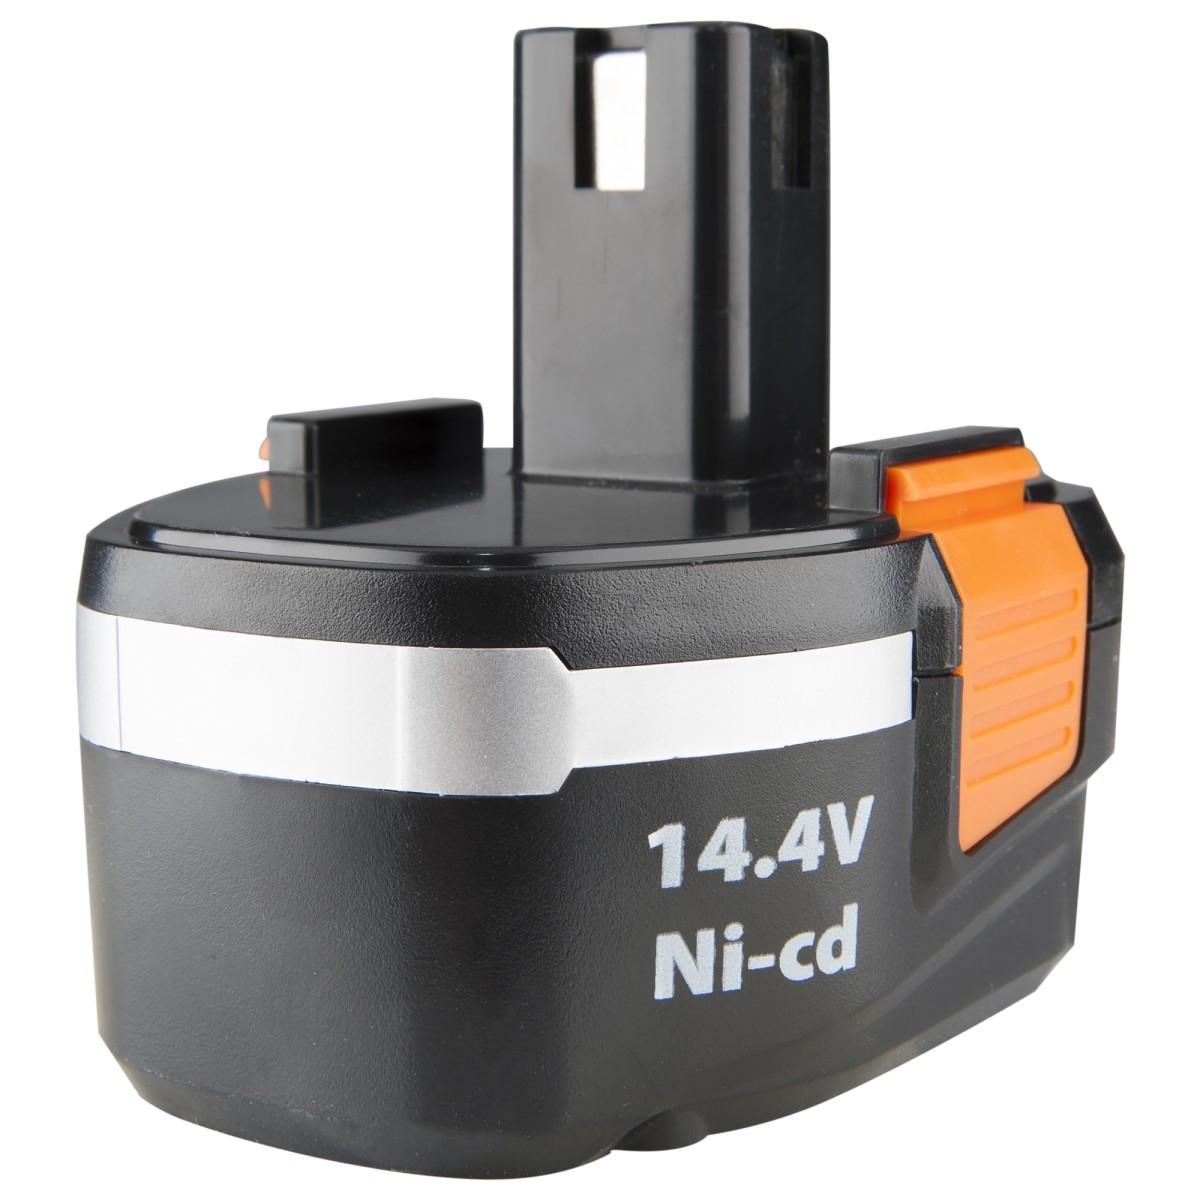 Аккумулятор Dexter 1.5 Ач Ni-Cd 14.4 В для аккумуляторного инструмента